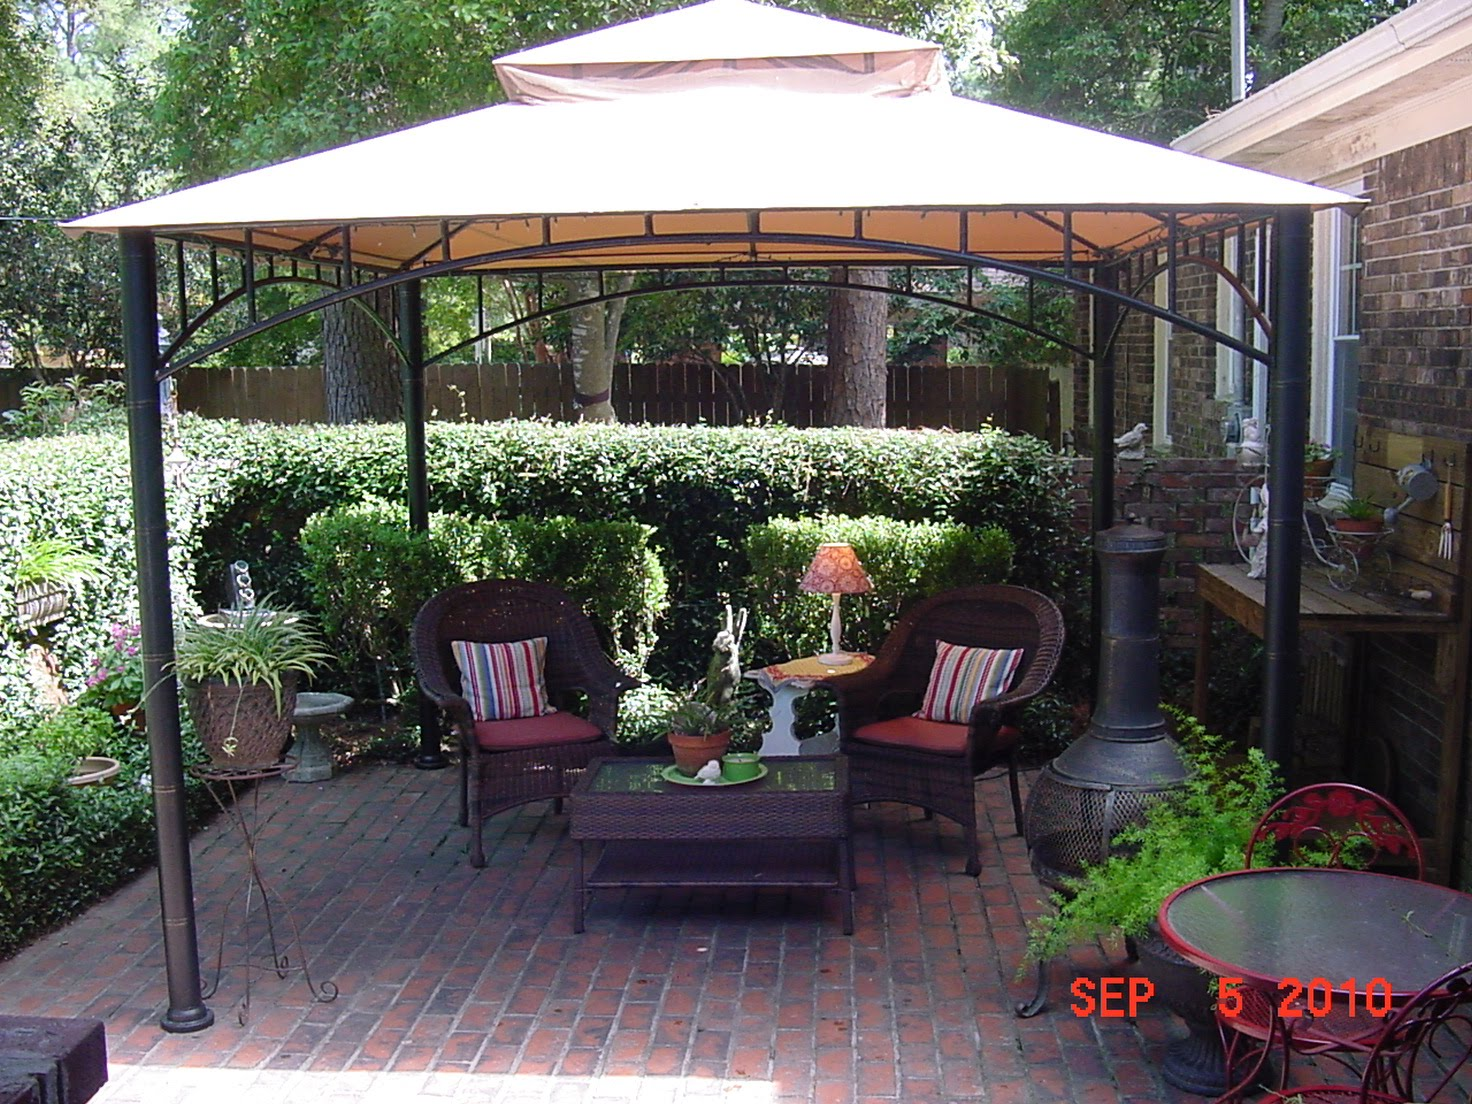 The Happy Homebody: My Patio Canopy on Shade For Backyard Patio id=22502